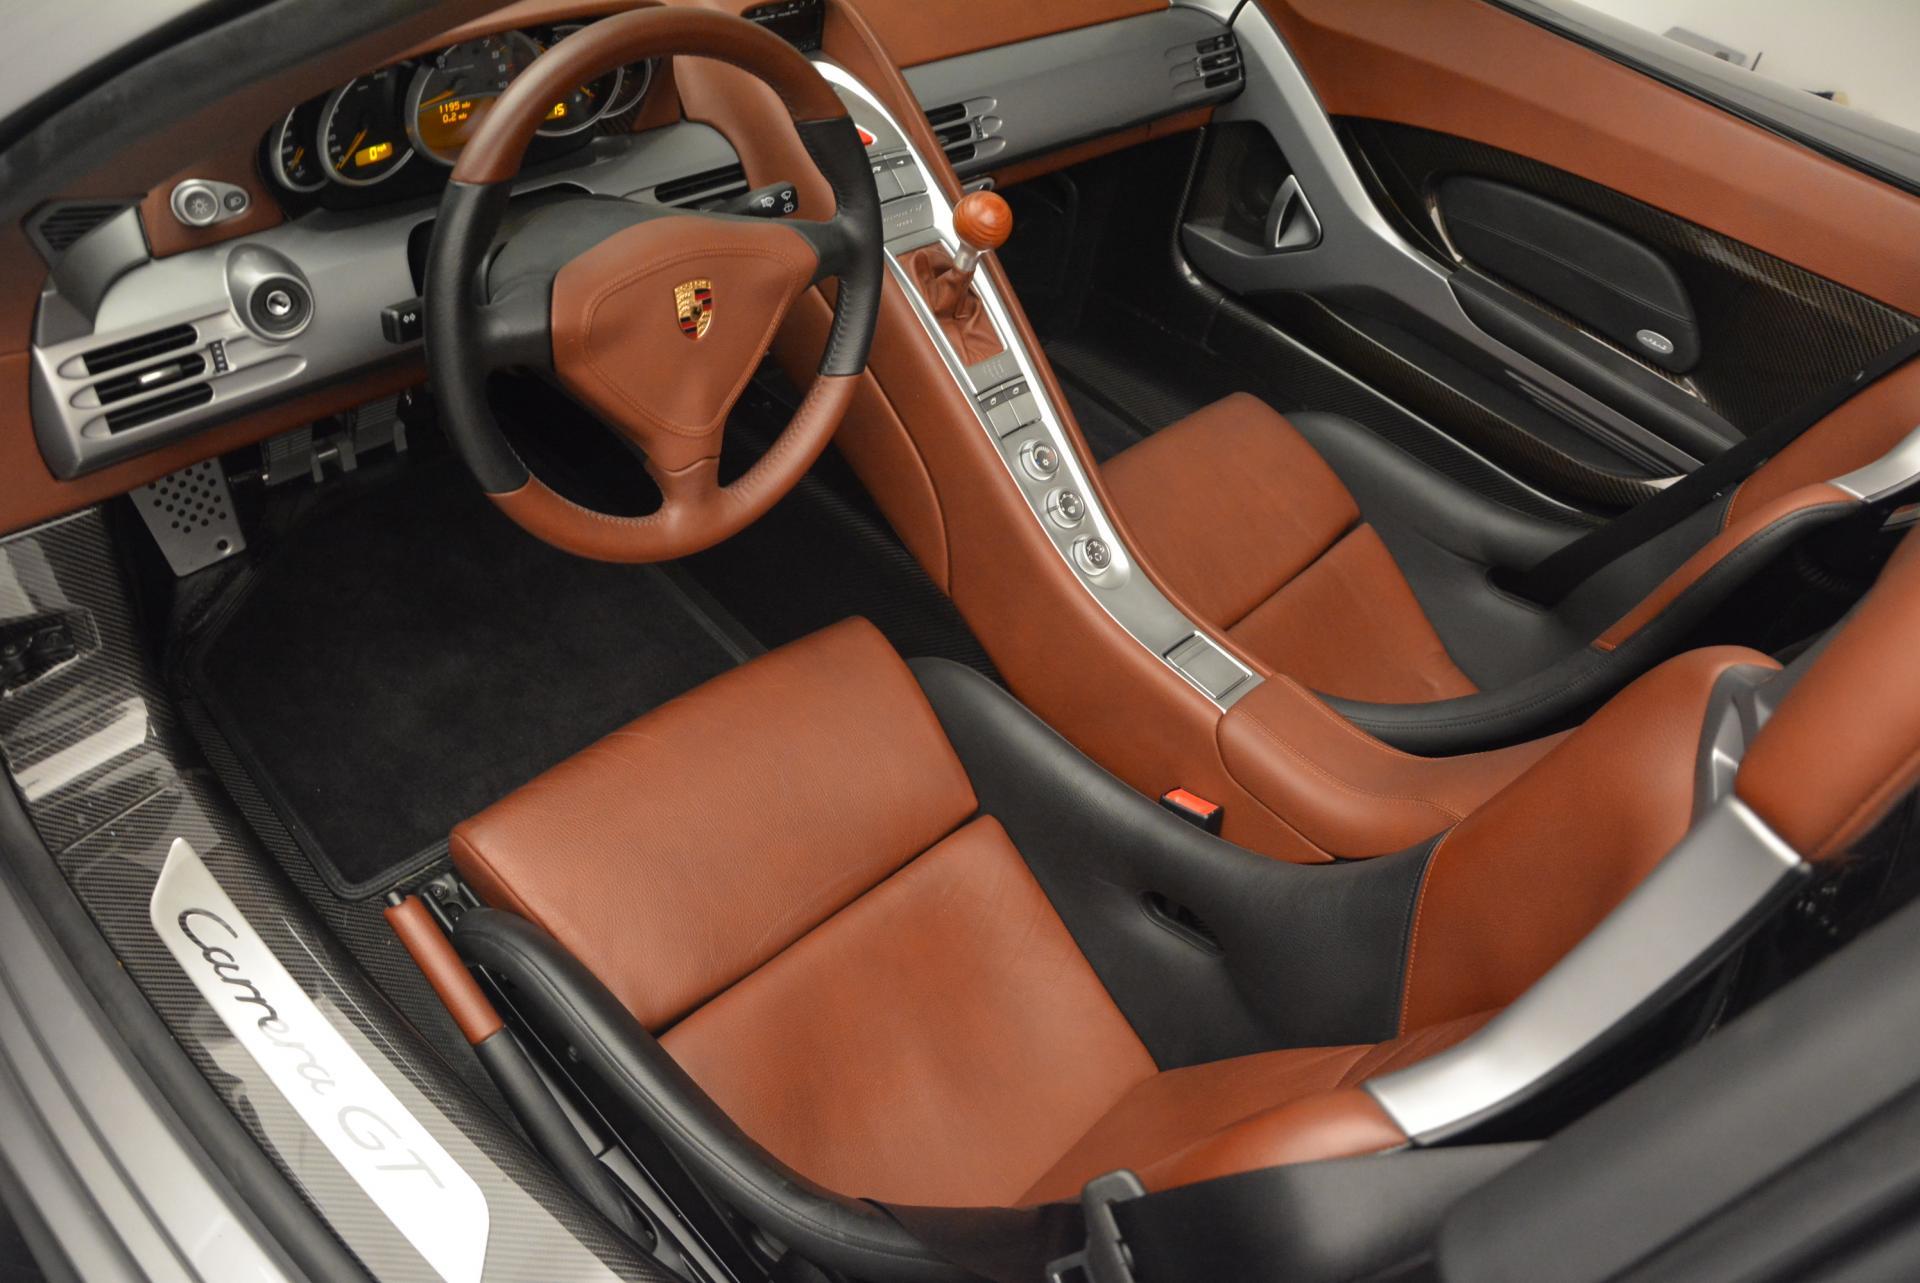 Used 2005 Porsche Carrera GT  For Sale In Greenwich, CT 108_p17